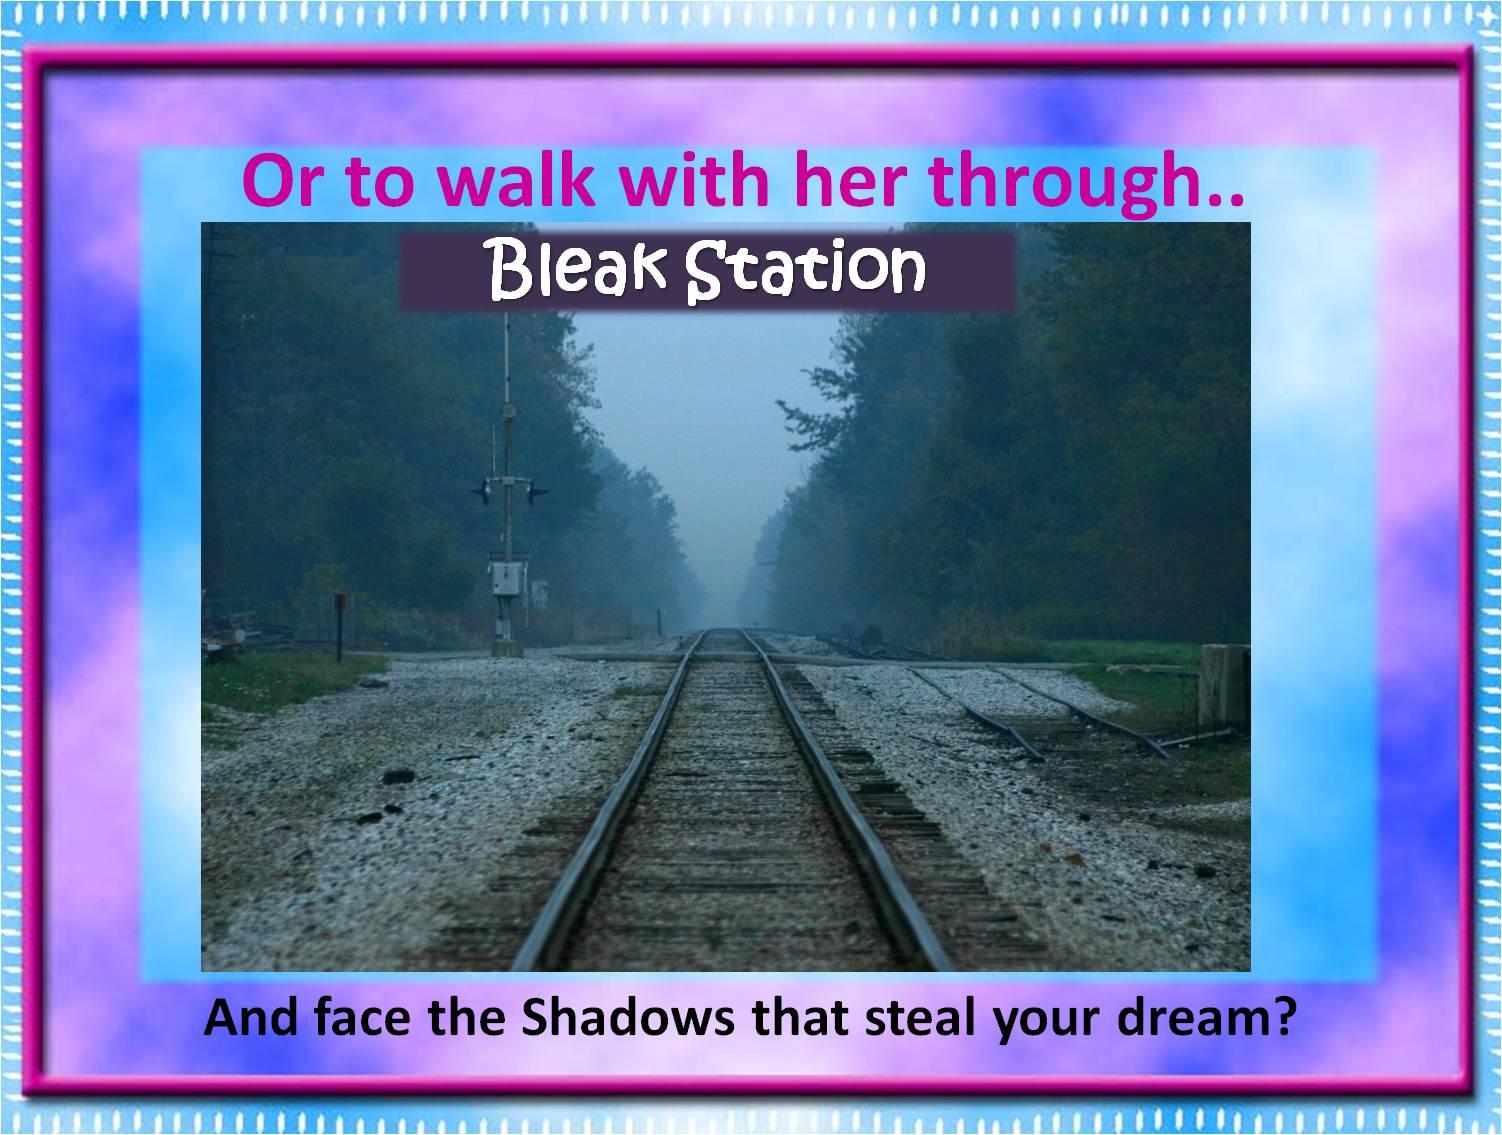 dreamexpress-virtualtourB-slide9-bleak-station